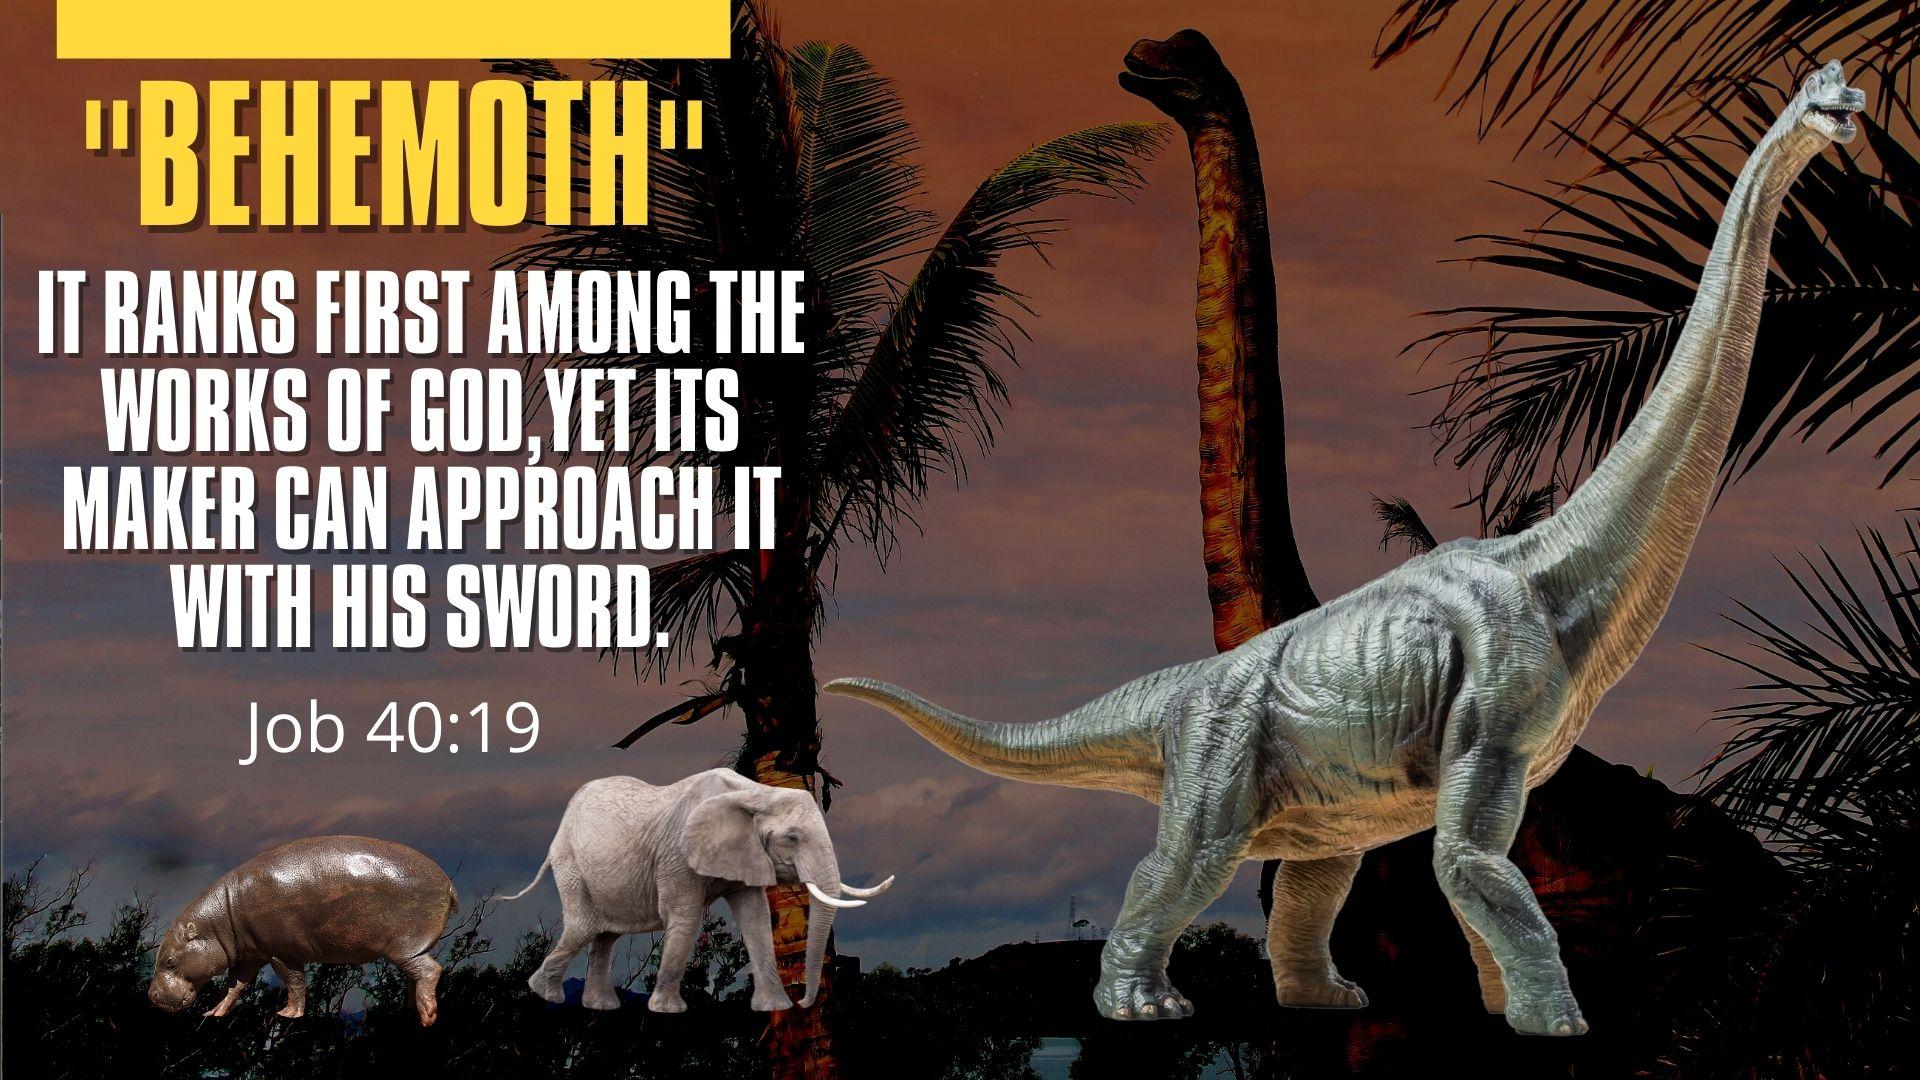 Behemoth.Job 40.19